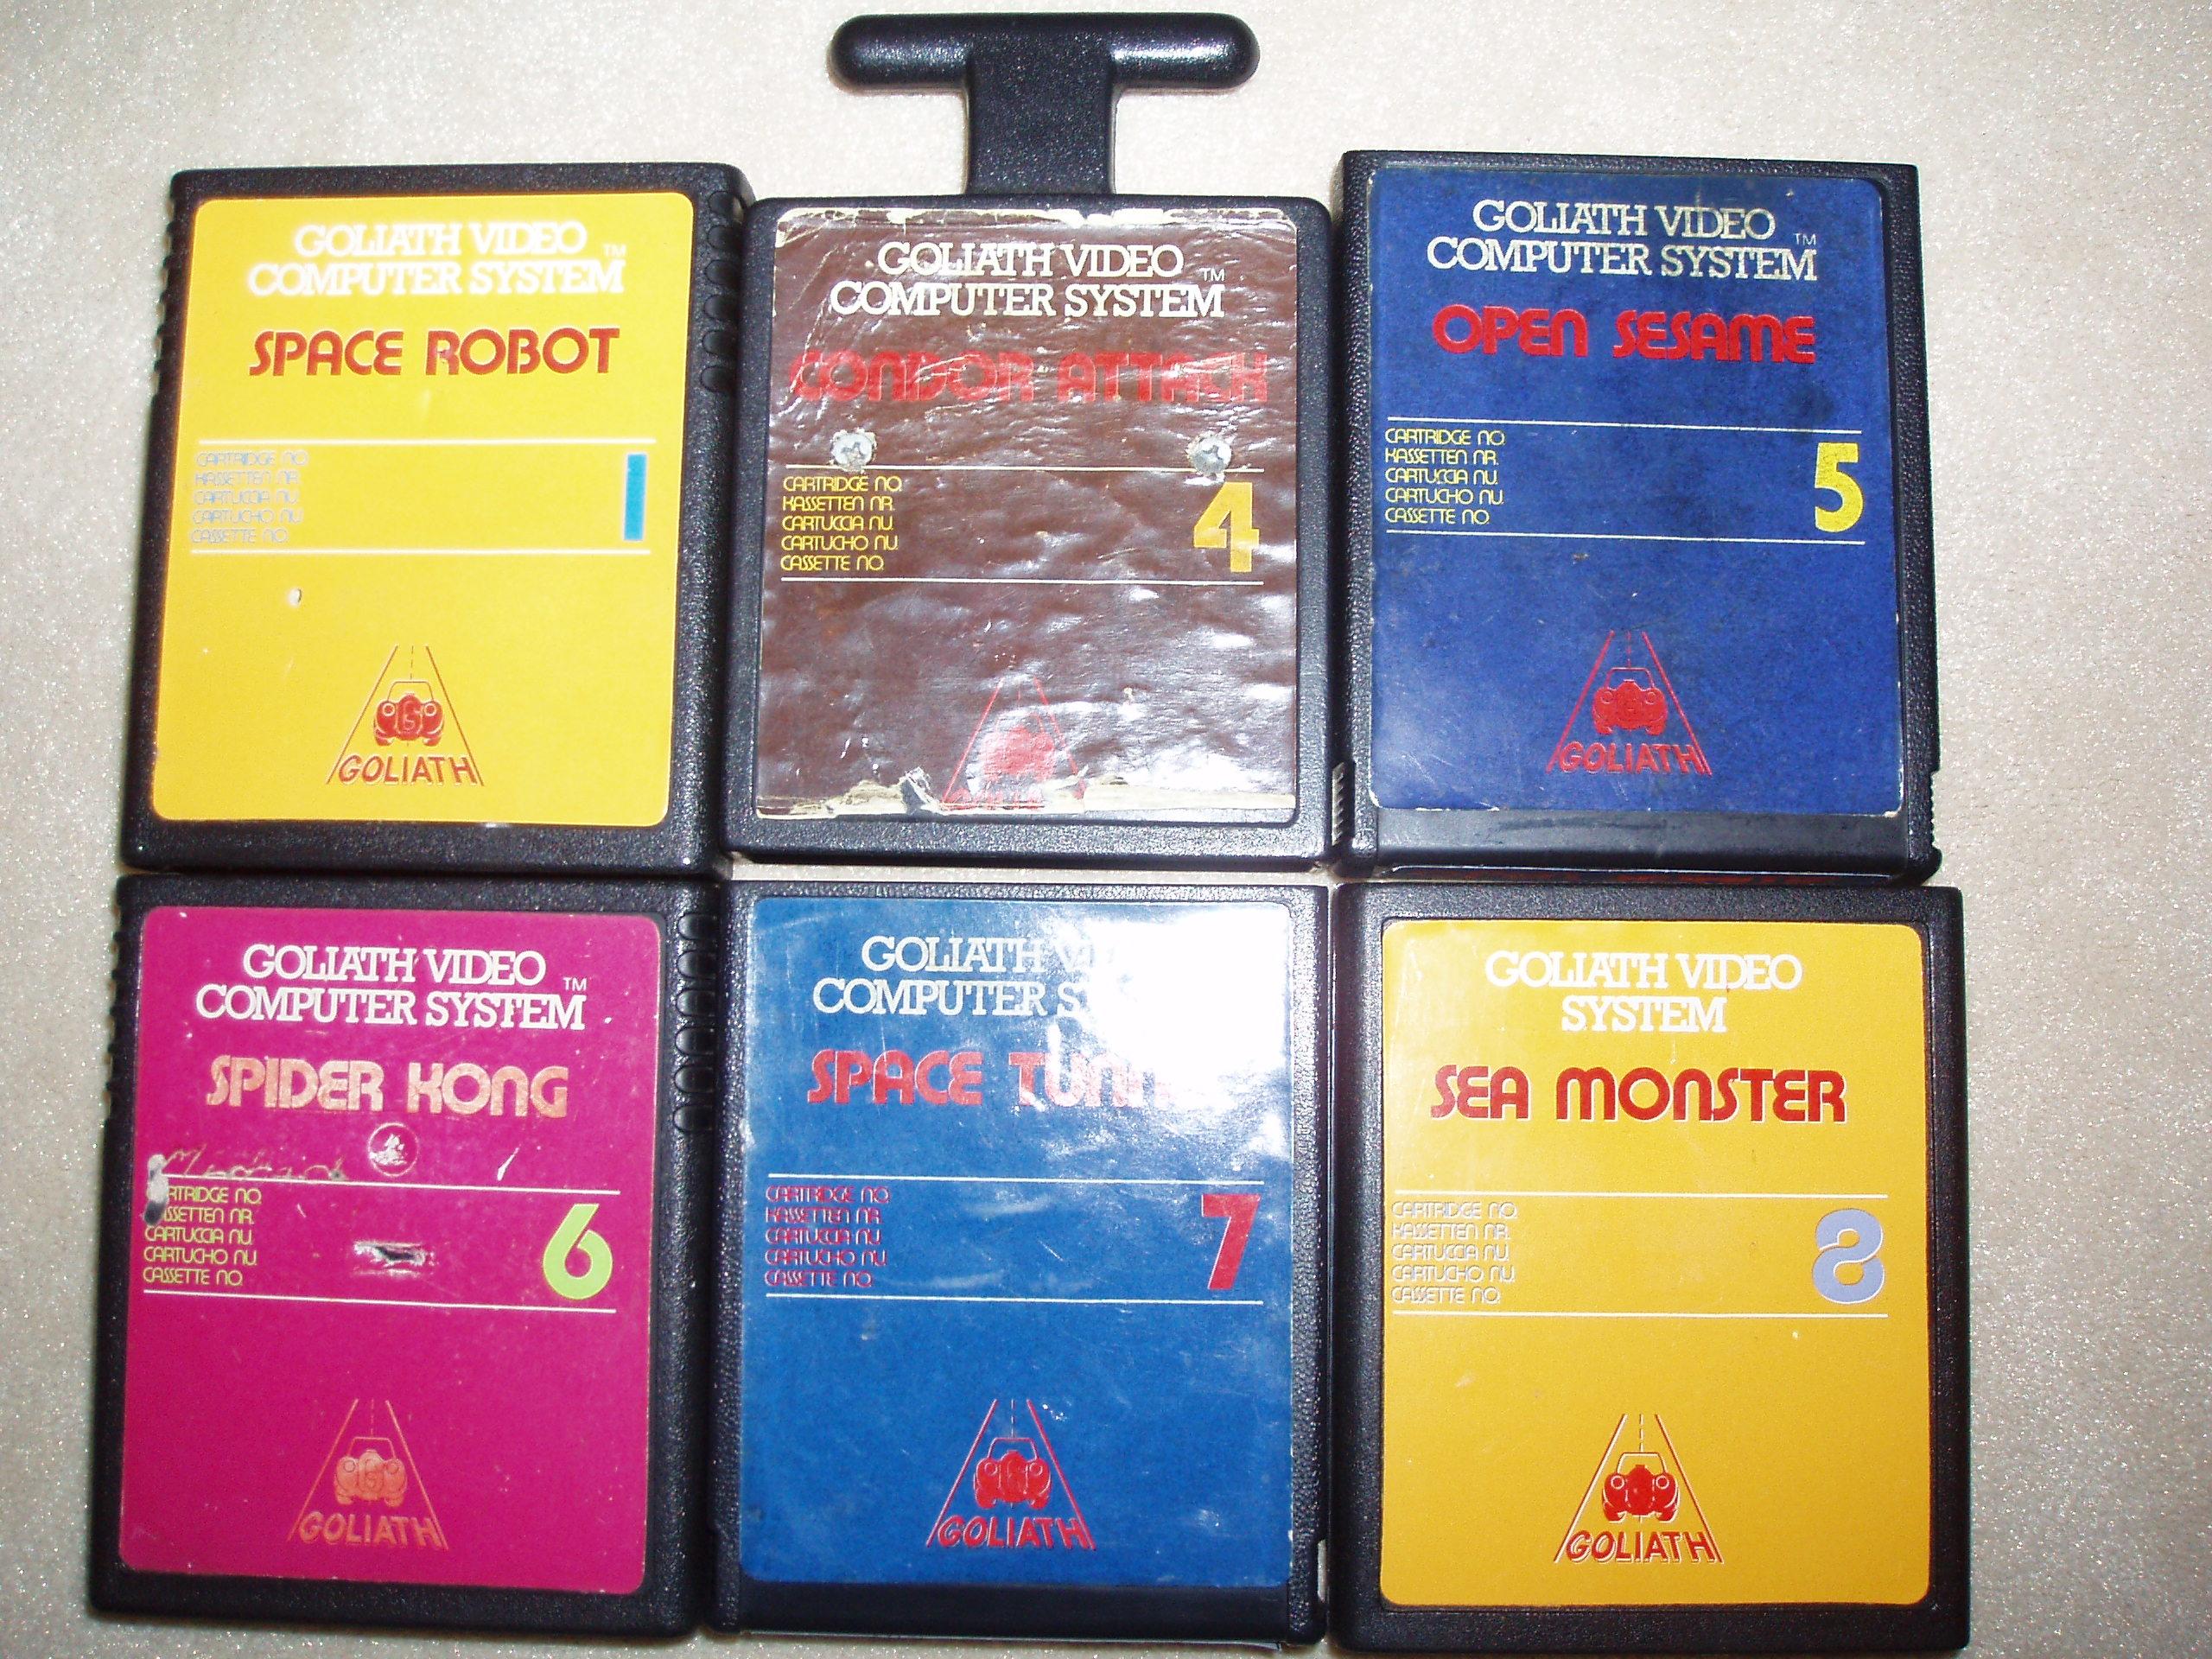 atari2600forever: Open Sesame (Atari 2600) 41,200 points on 2018-11-24 04:44:12